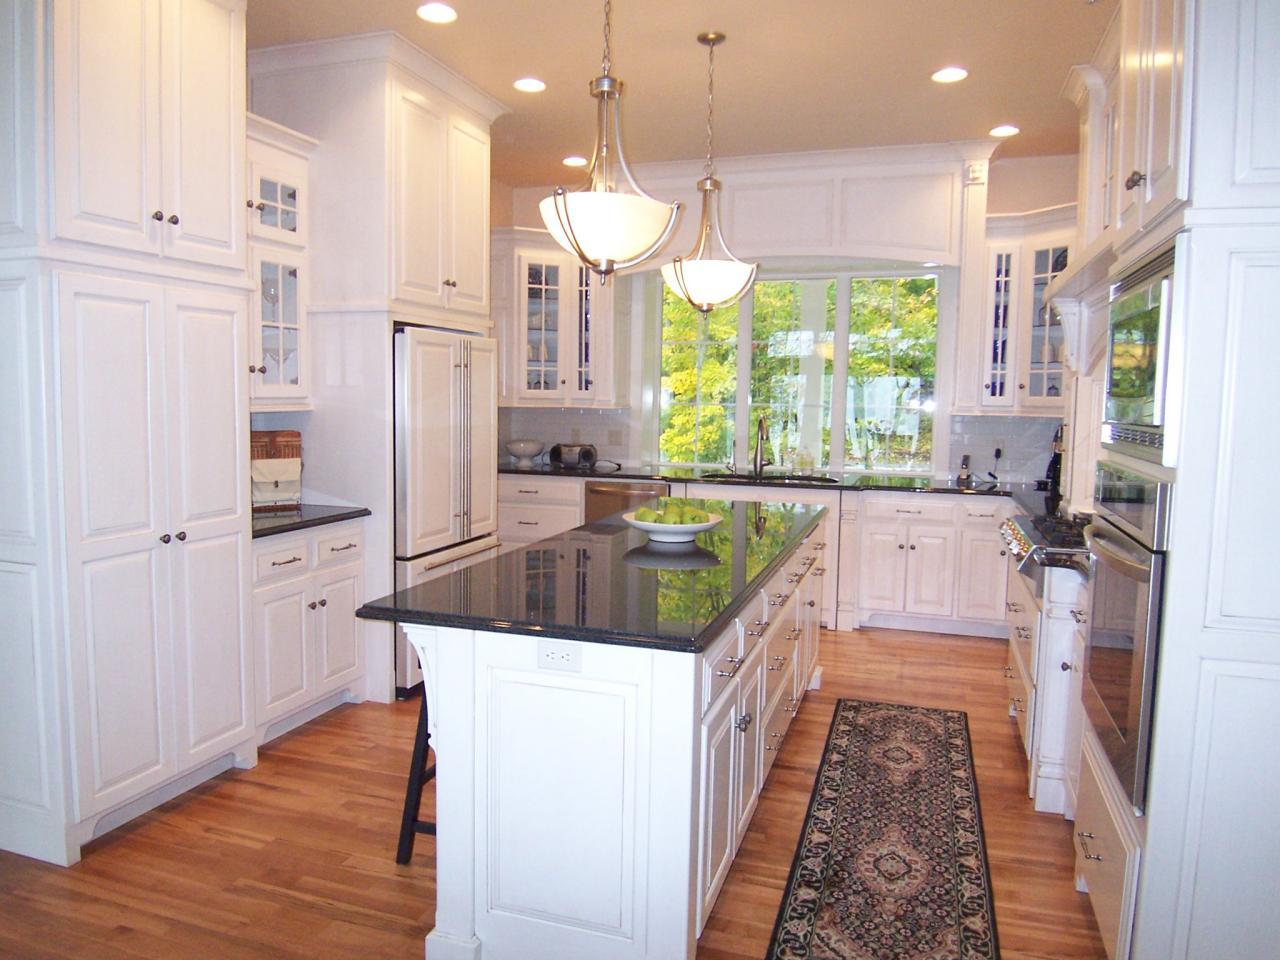 hgtv u shaped kitchen designs photo - 1